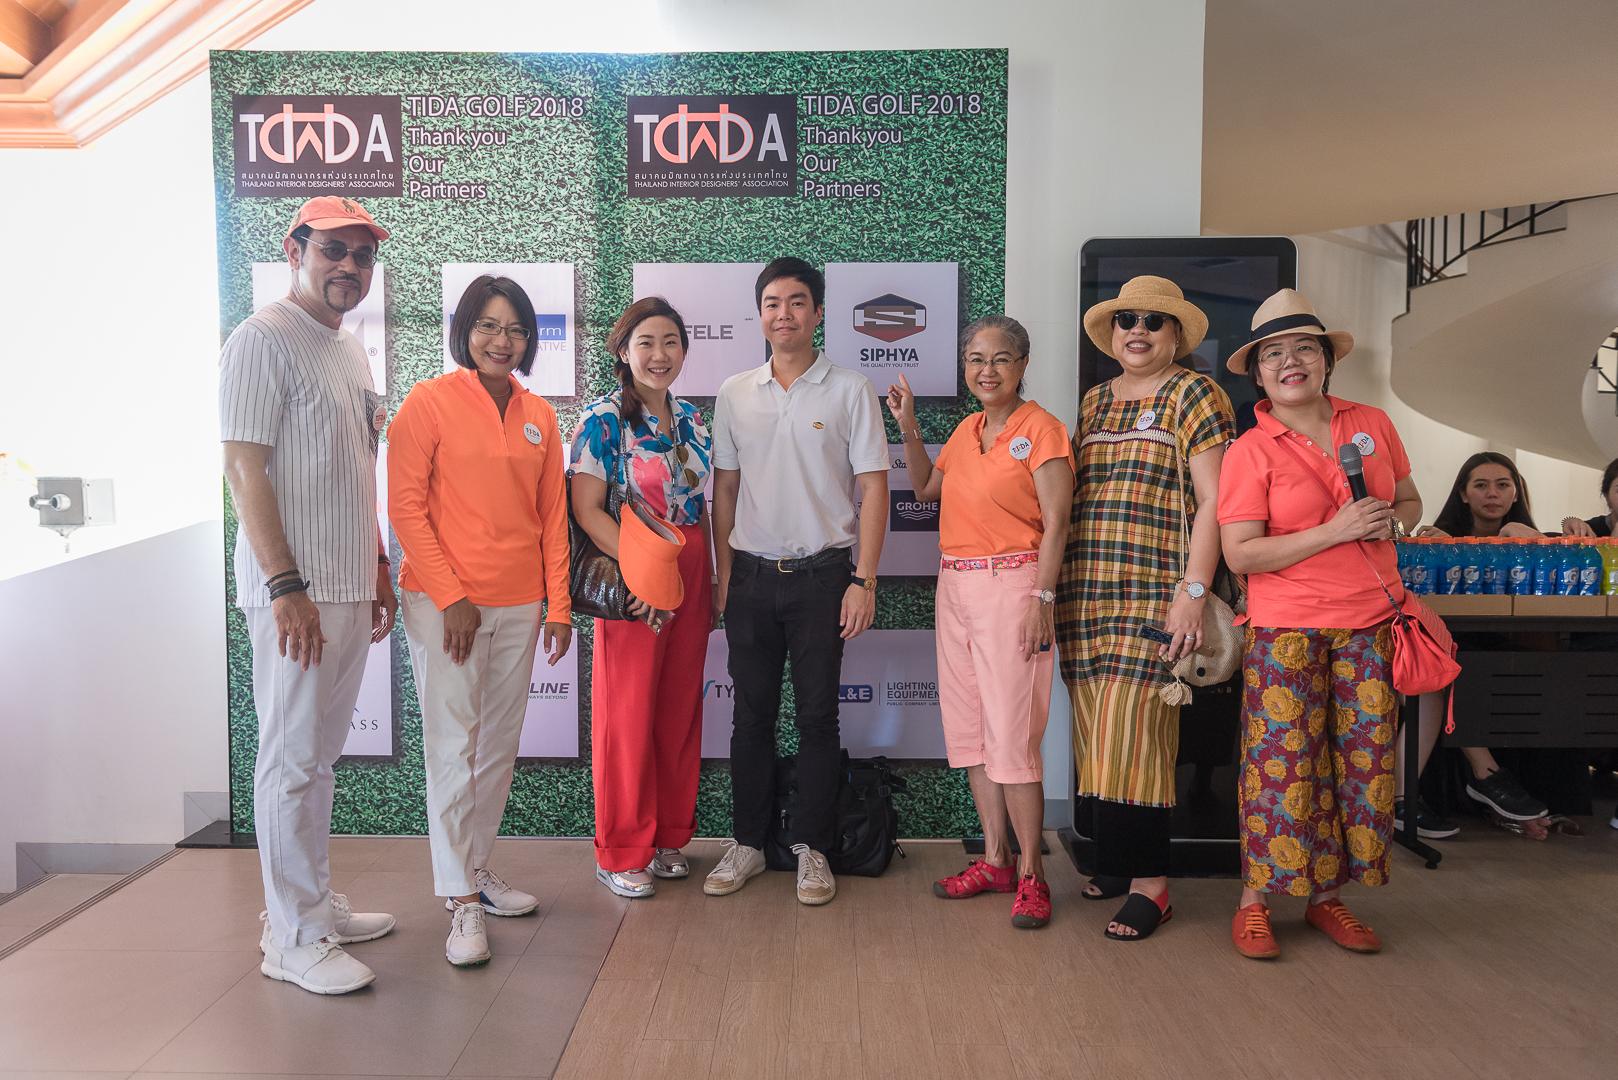 TIDA GOLF 2018